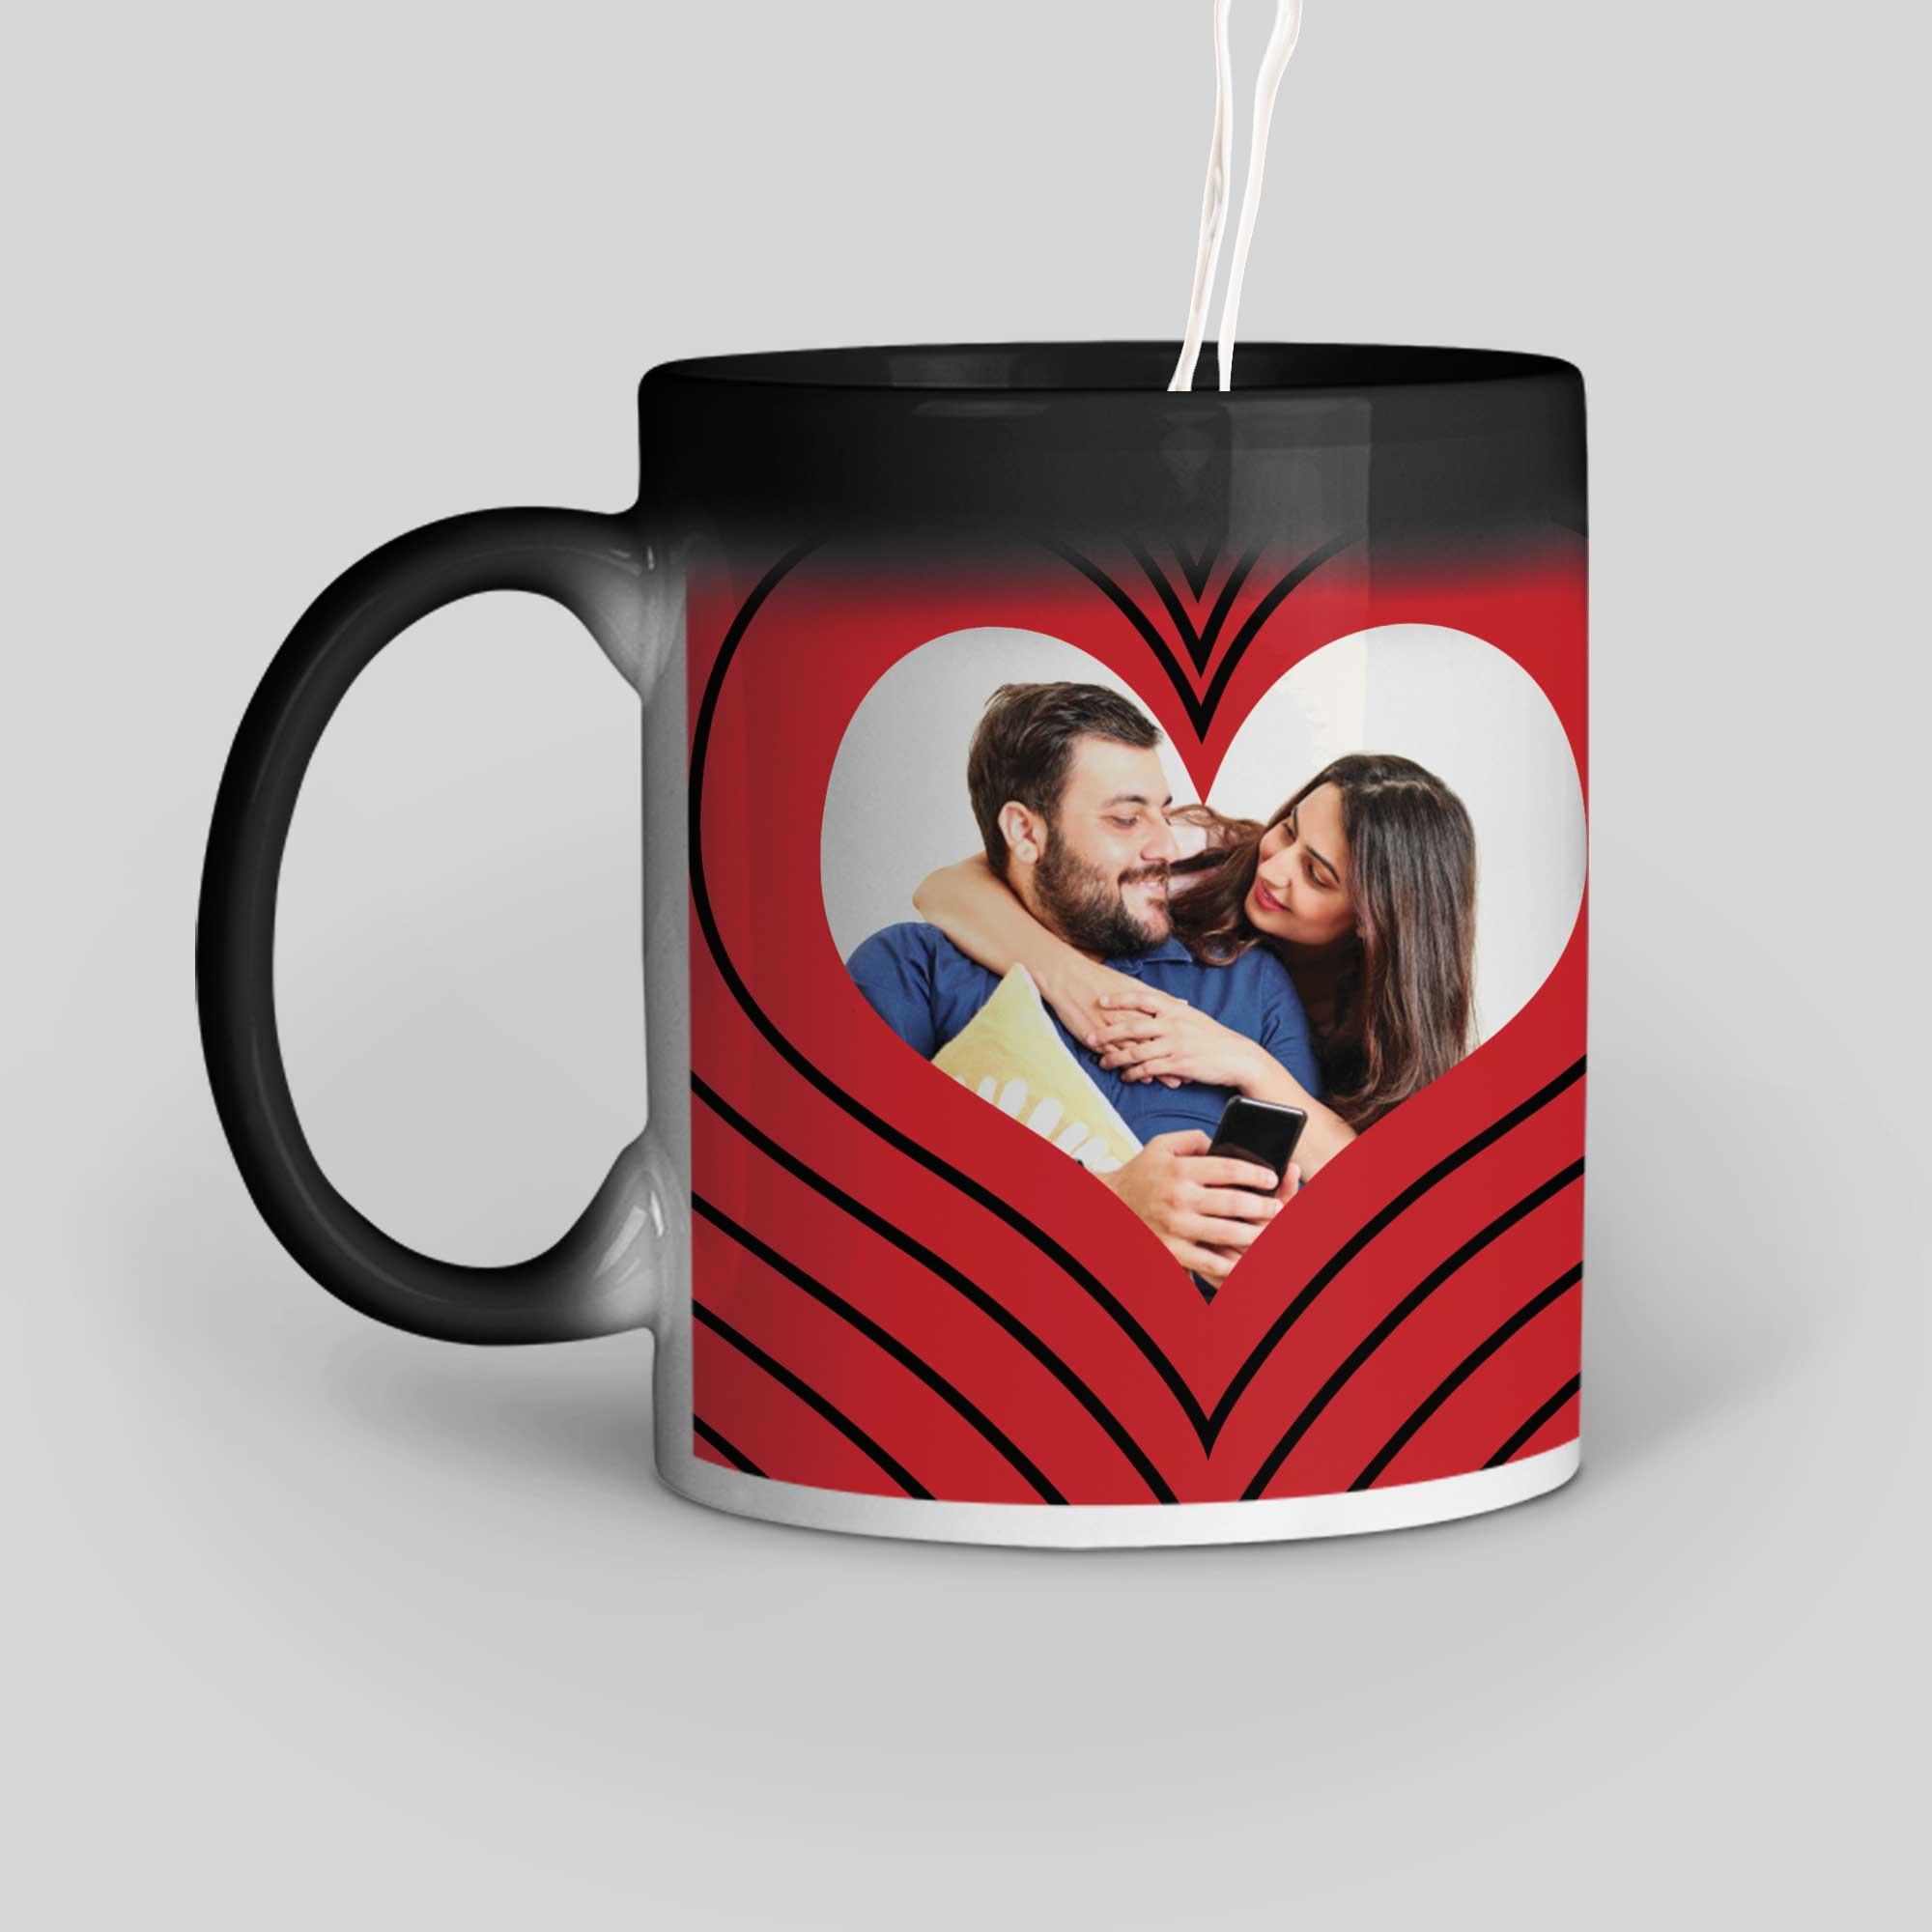 I Love You Personalized Magic Mug Left Side